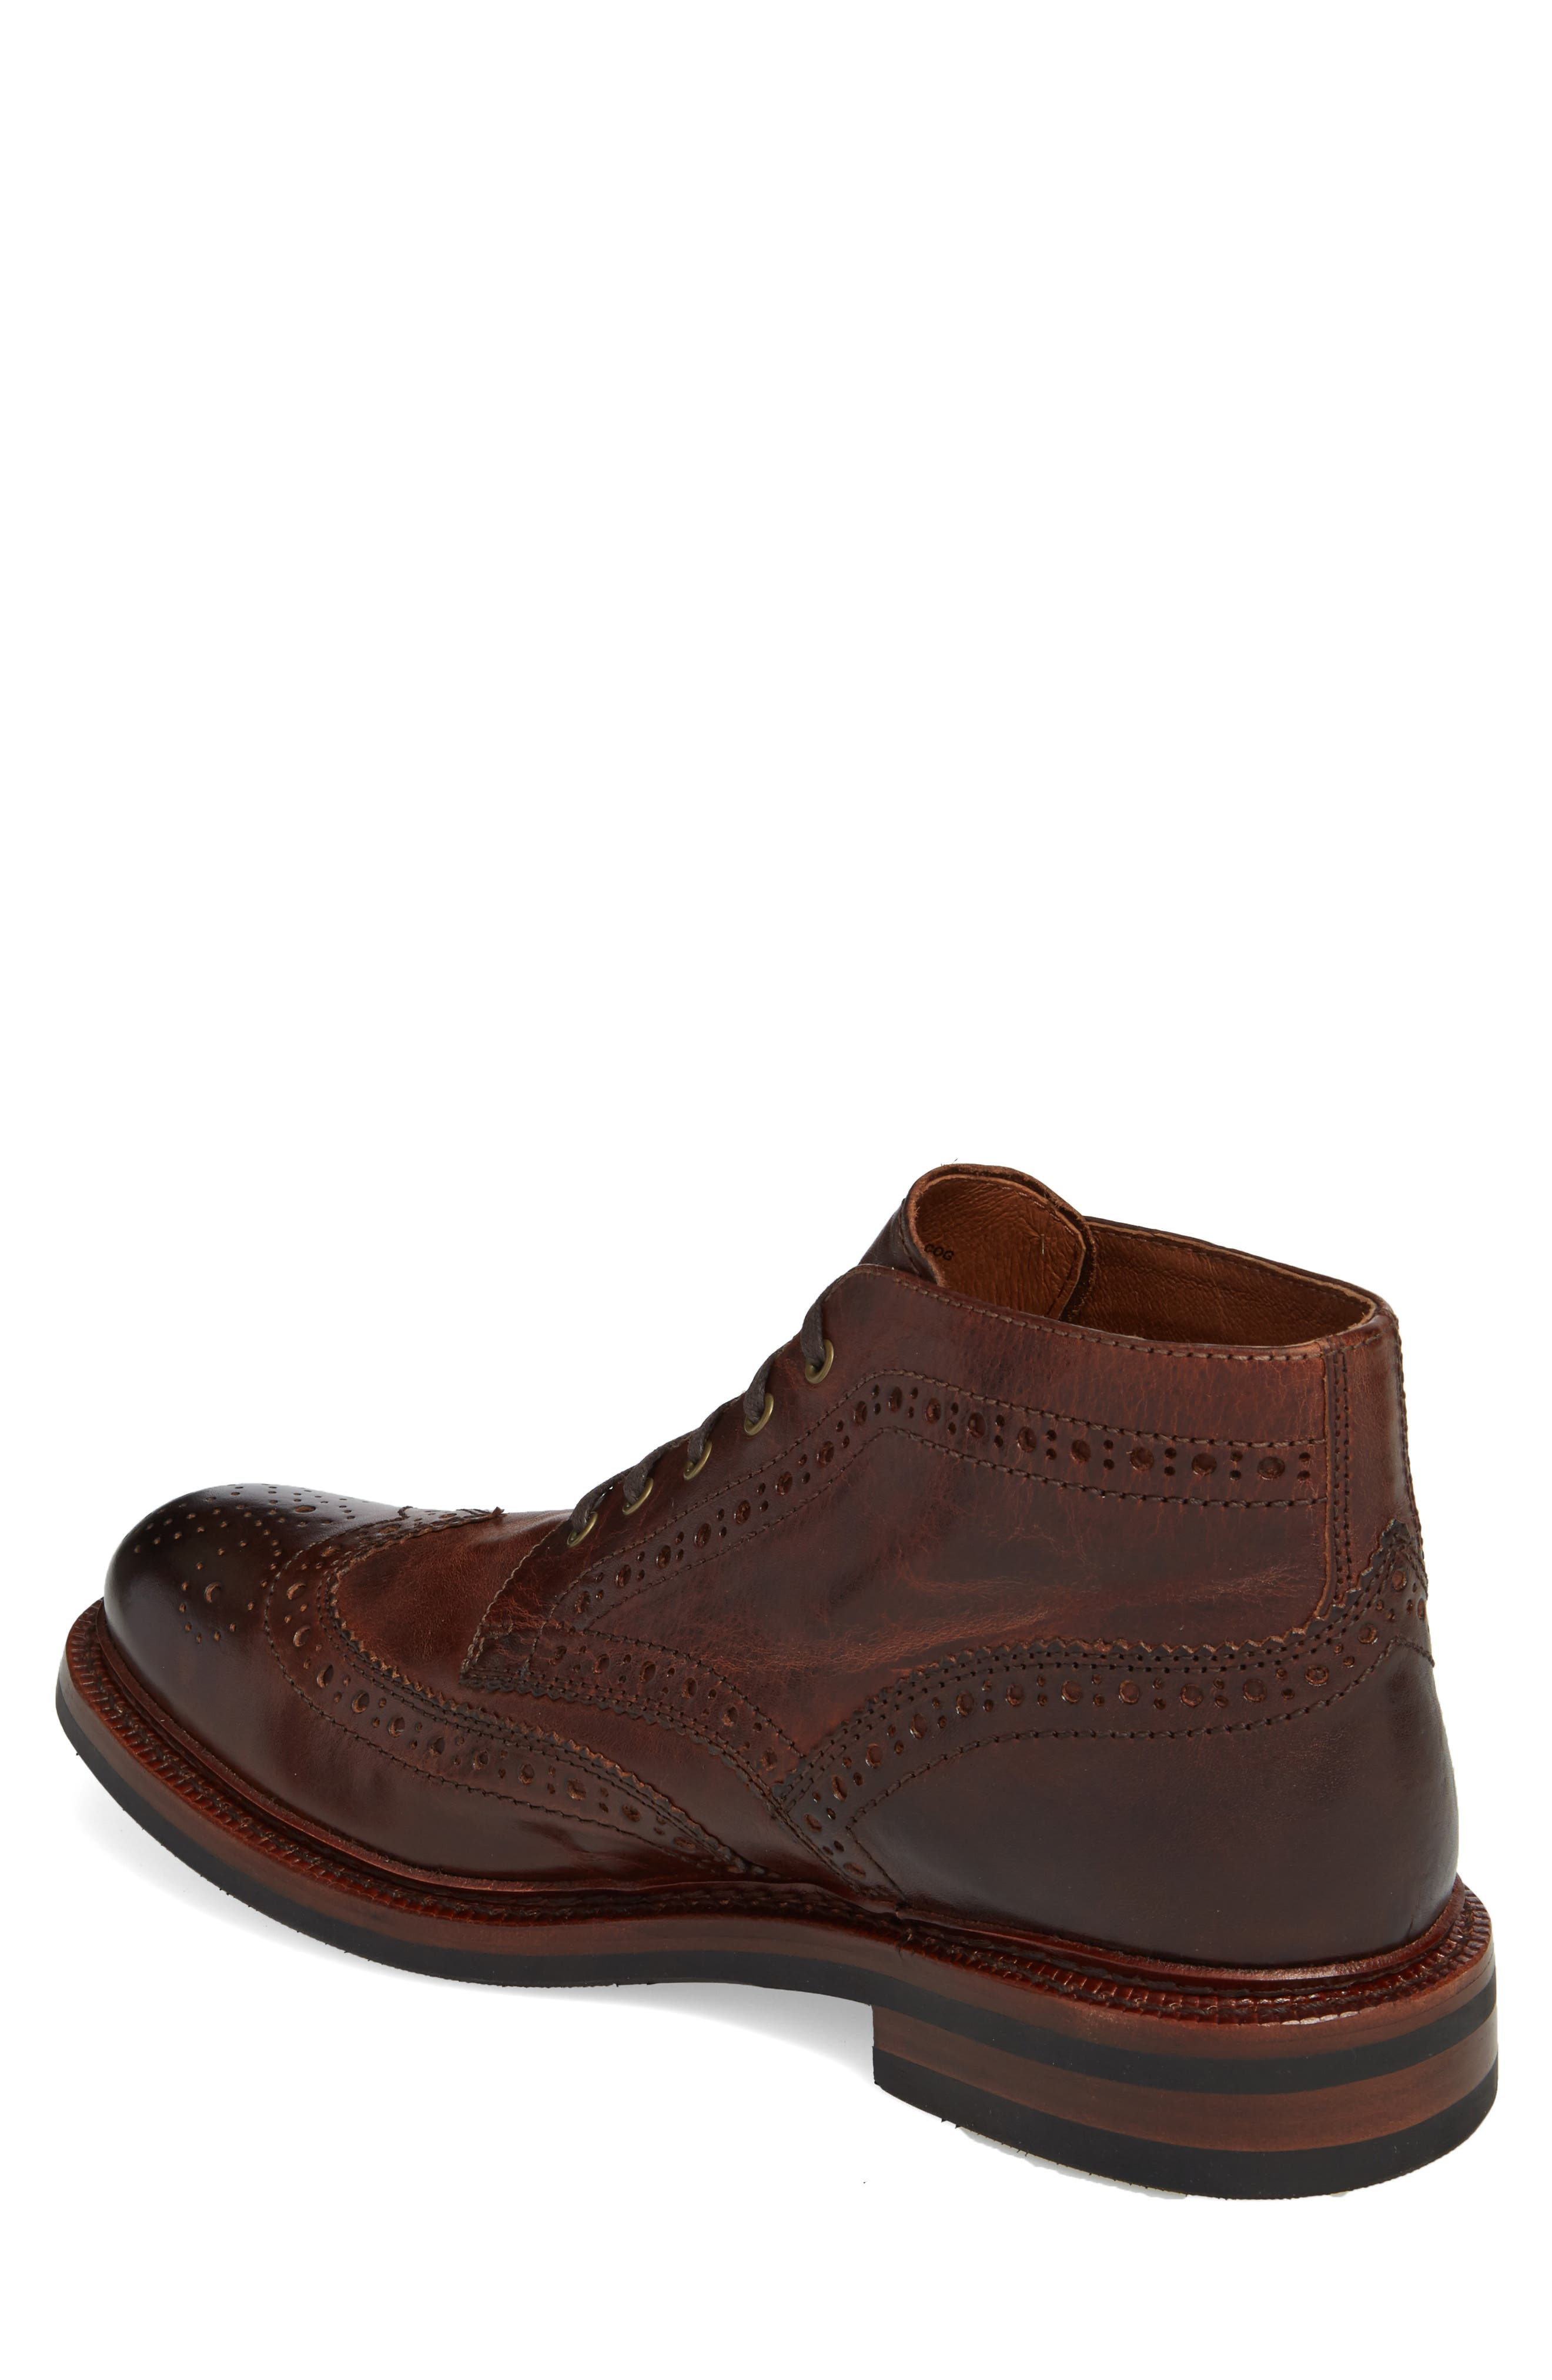 Graham Wingtip Boot,                             Alternate thumbnail 2, color,                             Cognac Leather